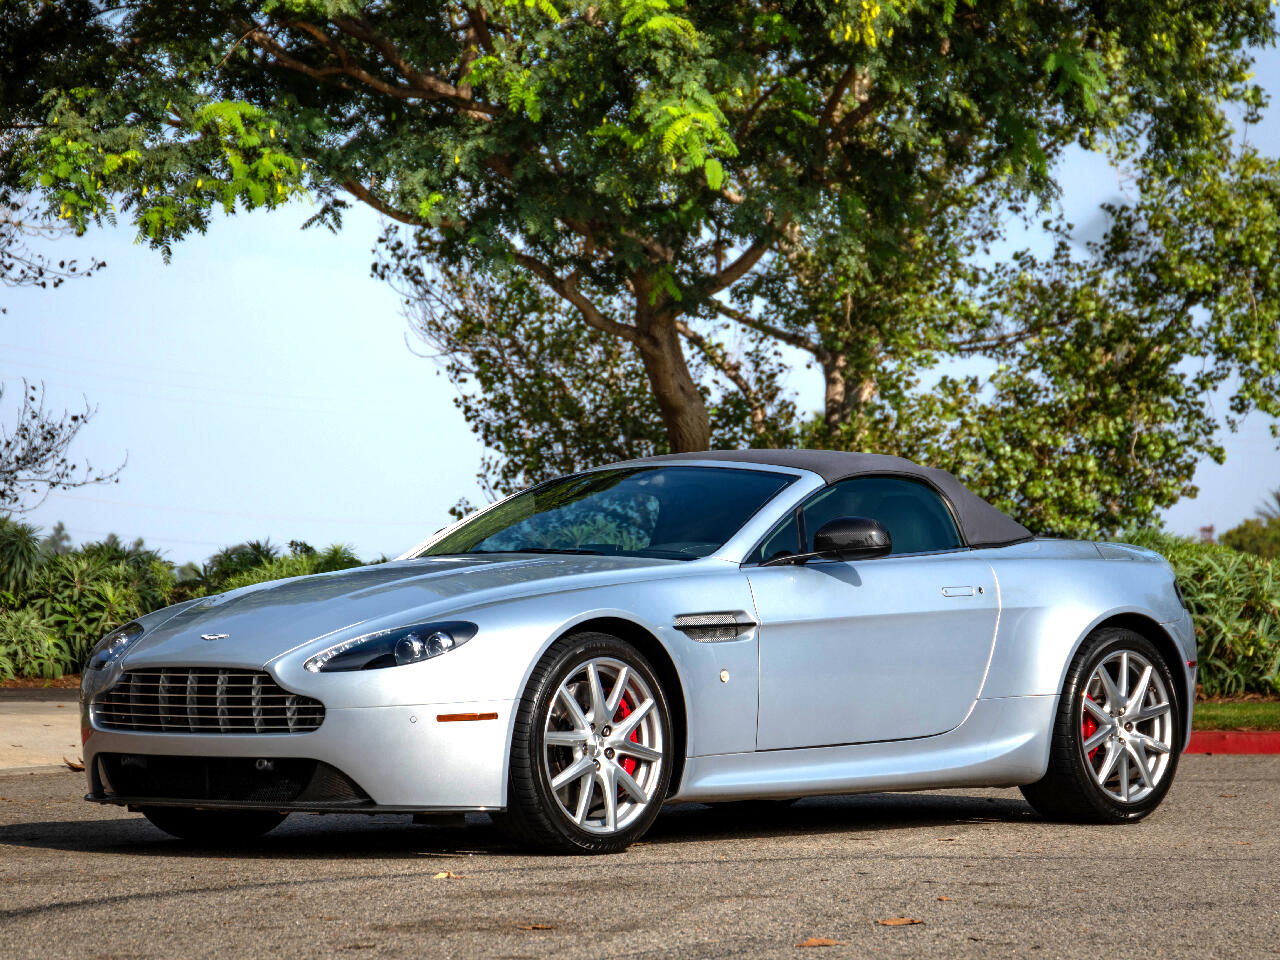 Aston Martin V8 Vantage Roadster 2014